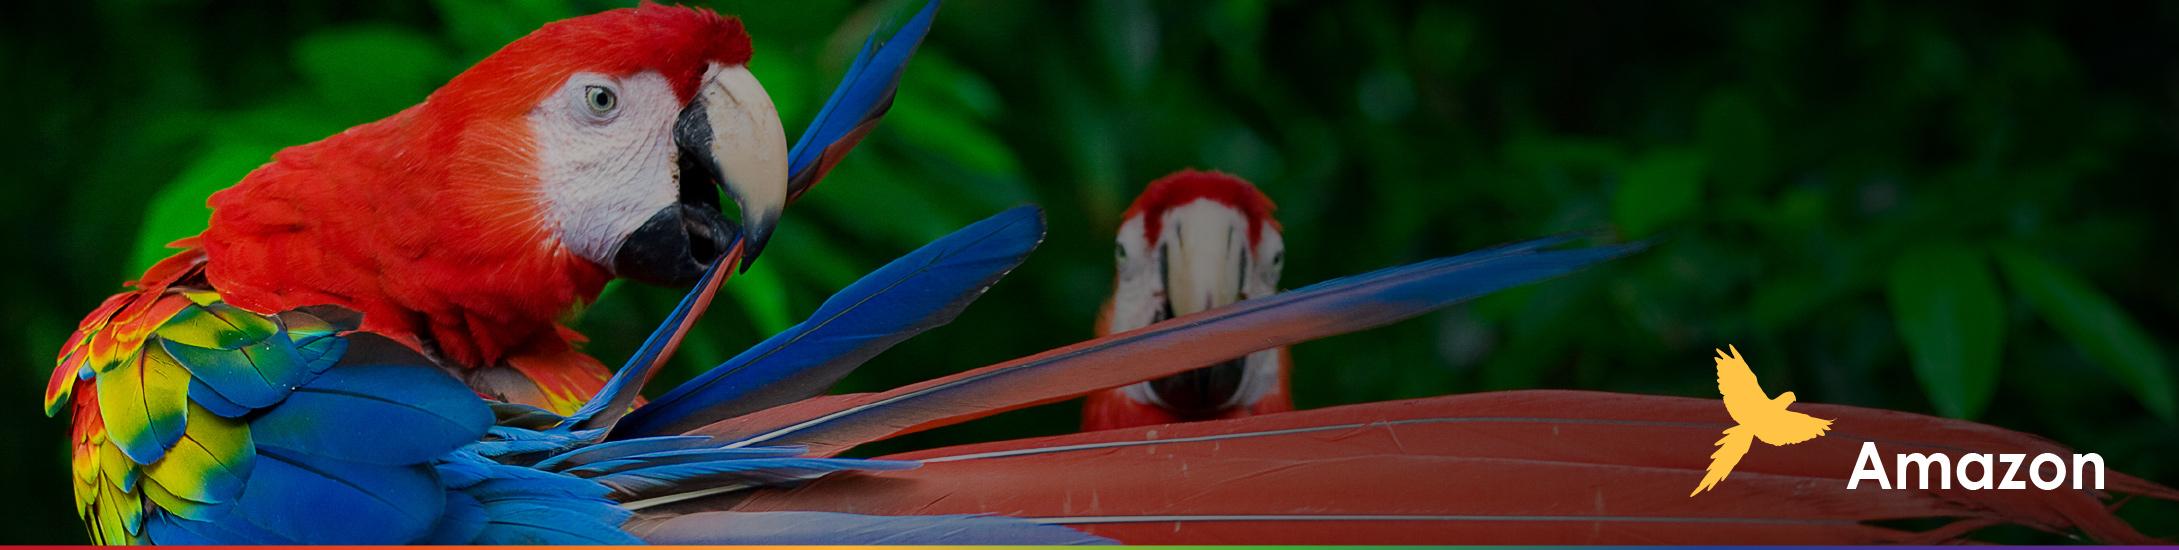 Amazon Ecuador tours for everyone safe travels wildlife